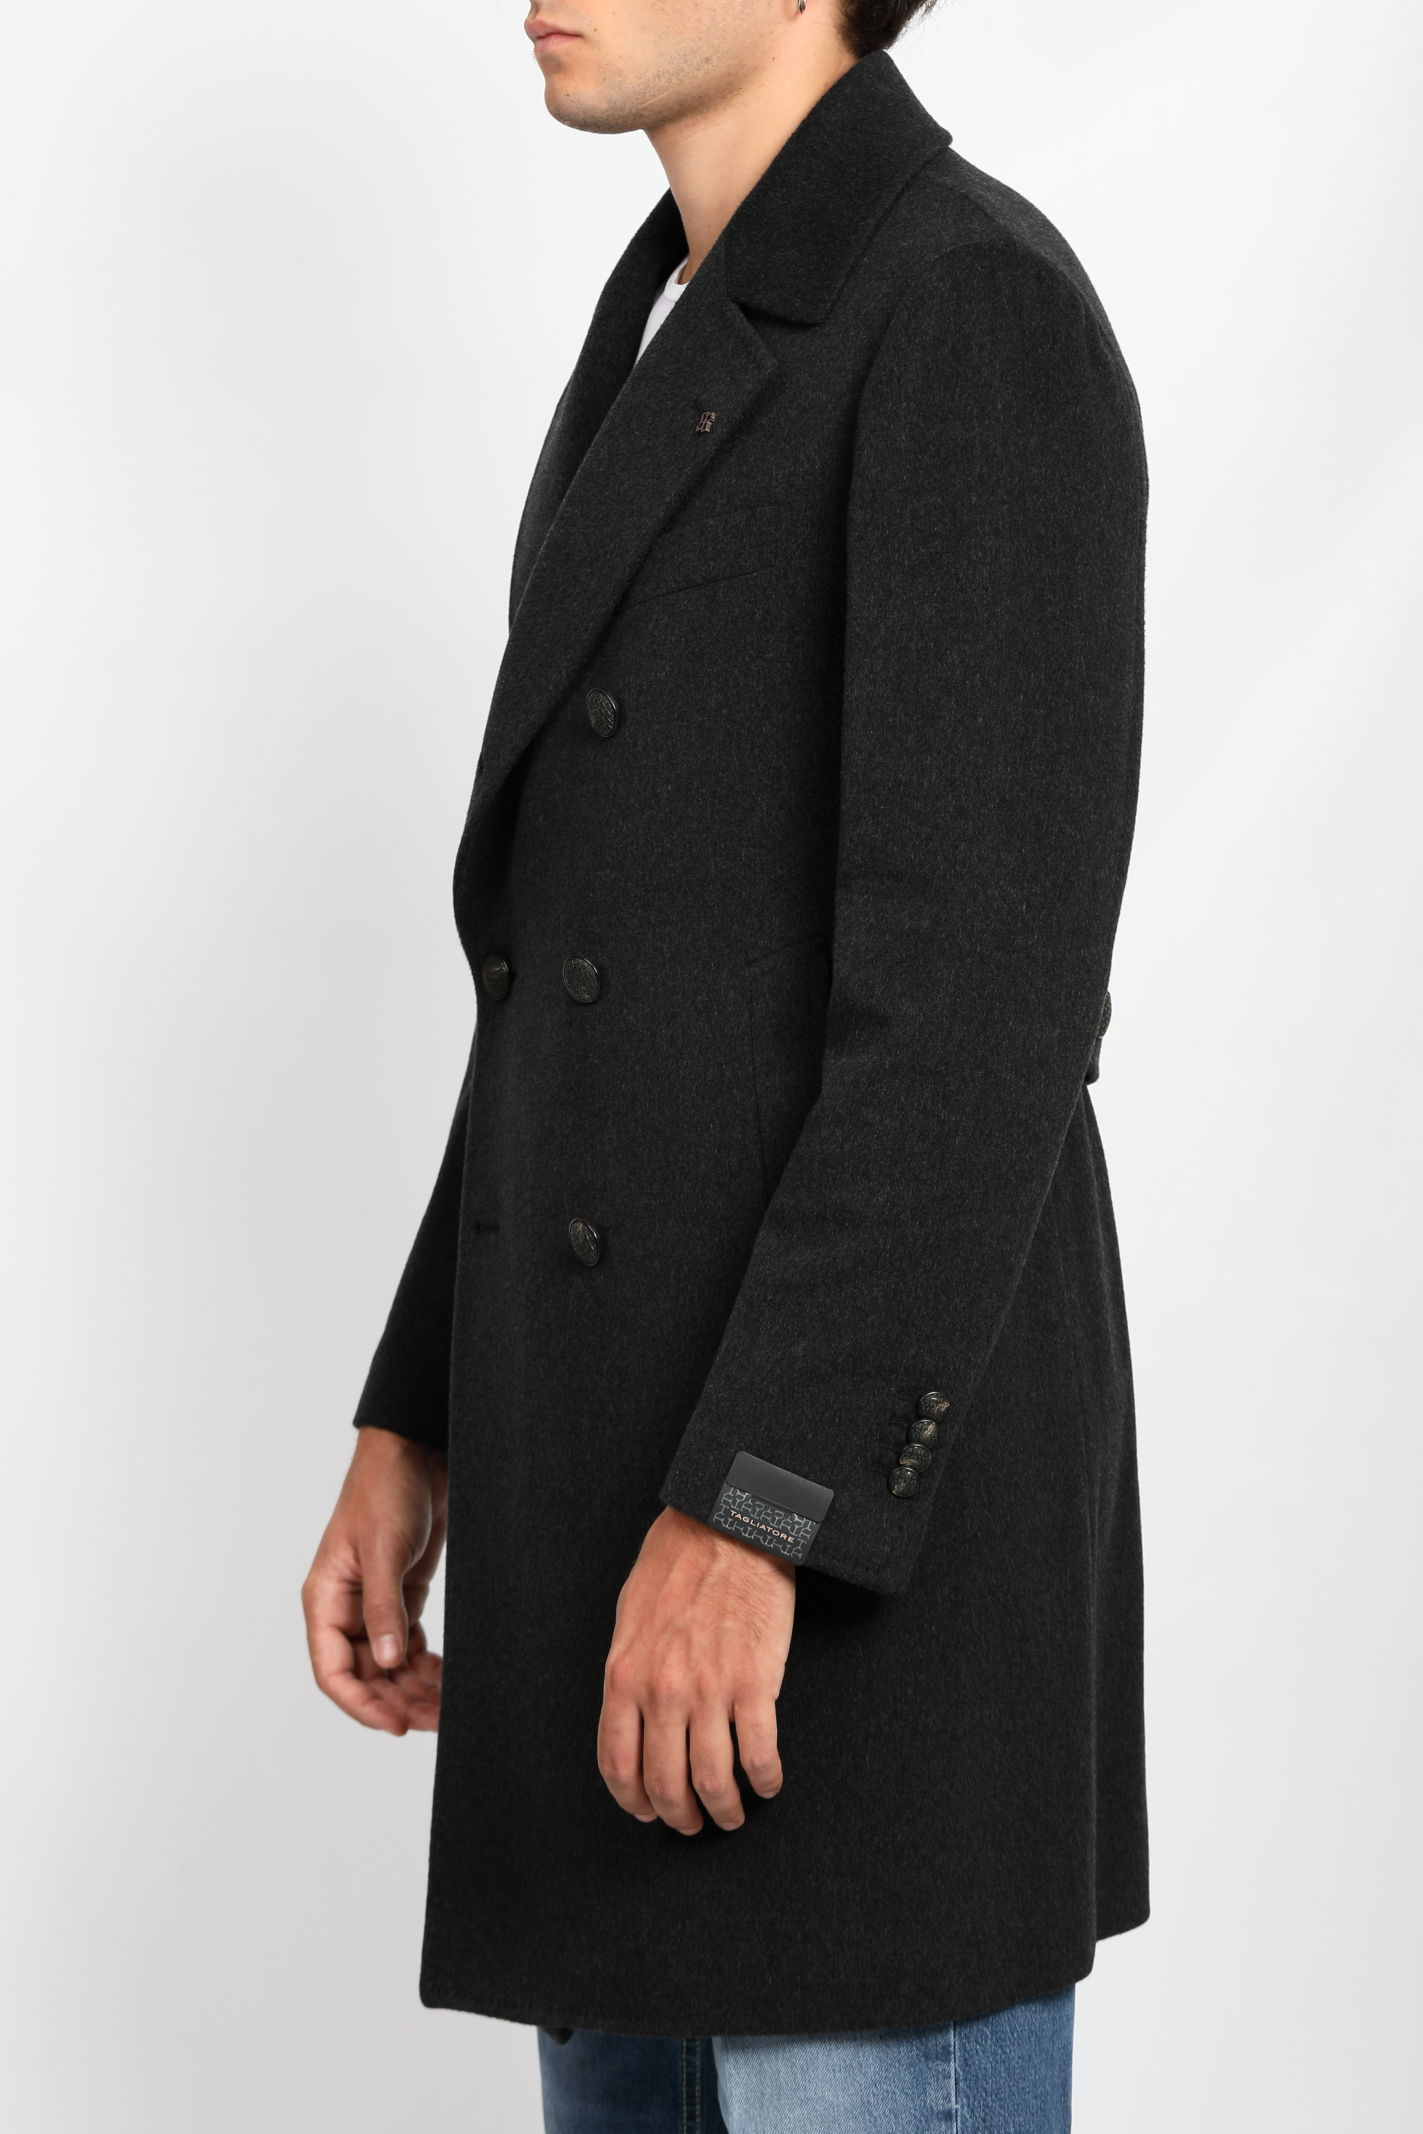 CACHEMIRE BLEND COAT TAGLIATORE   Coats   ARDEN-TRP-350001S3434